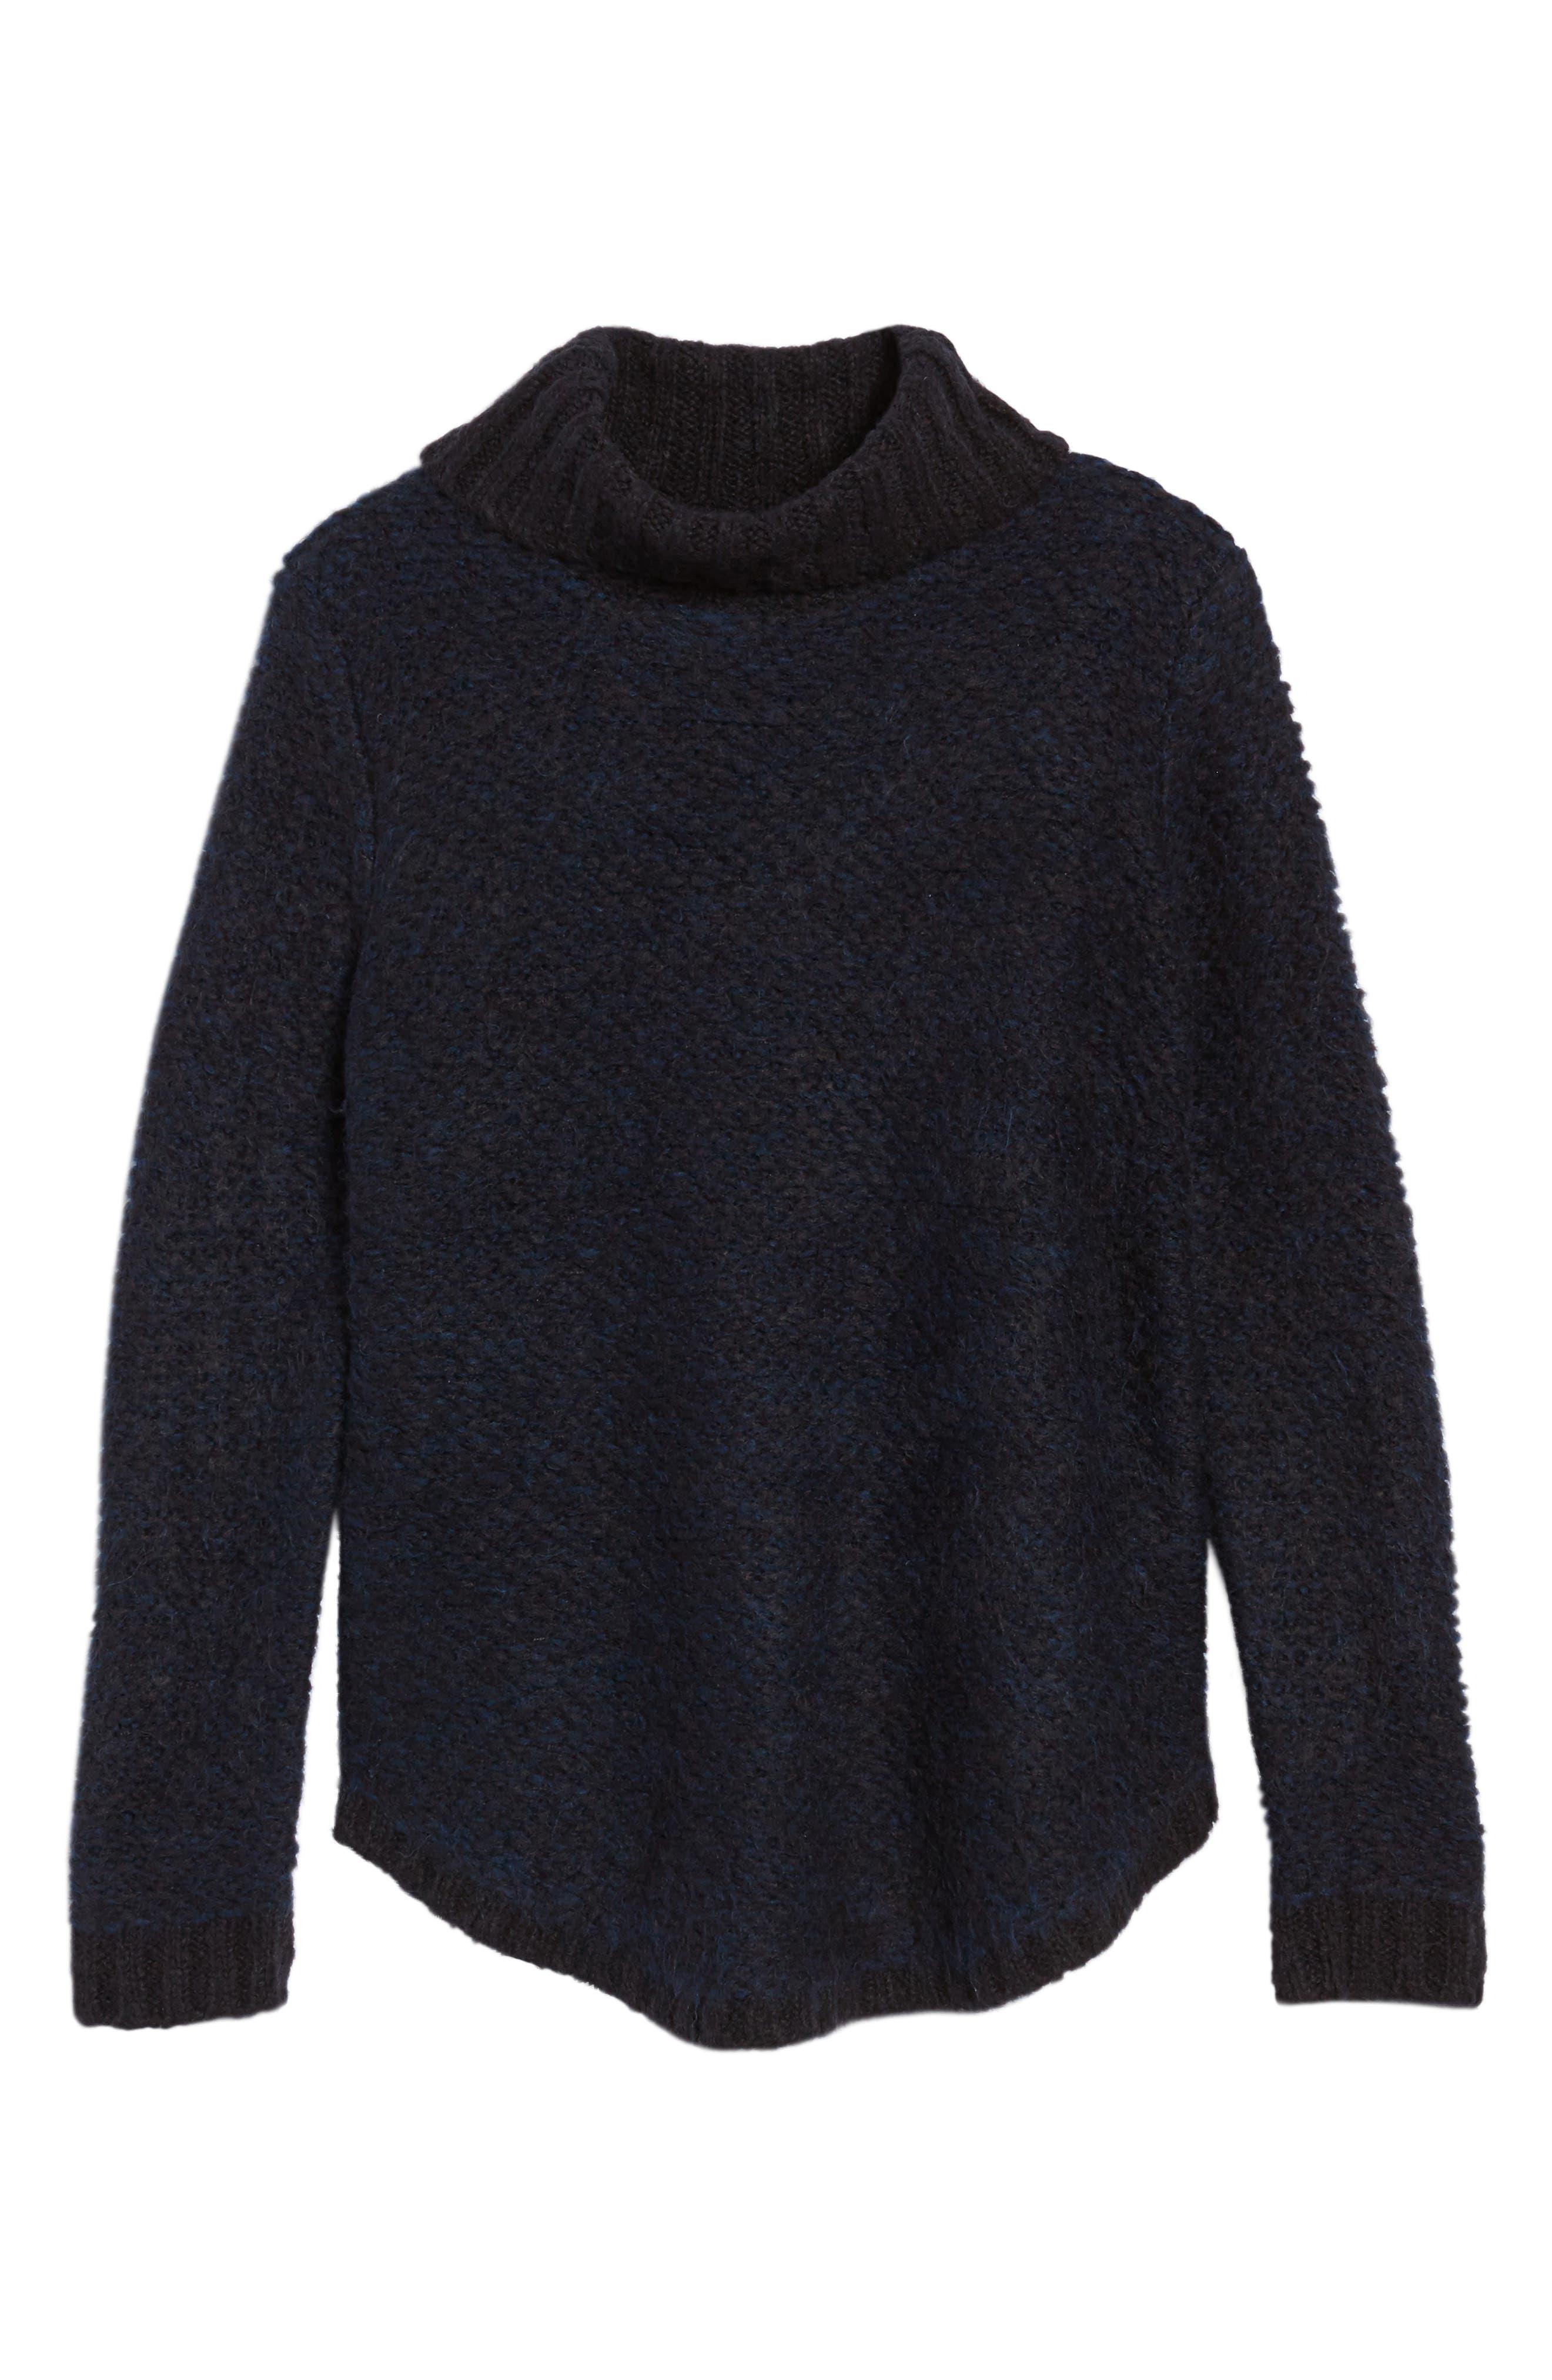 Kinks Turtleneck Sweater,                             Alternate thumbnail 11, color,